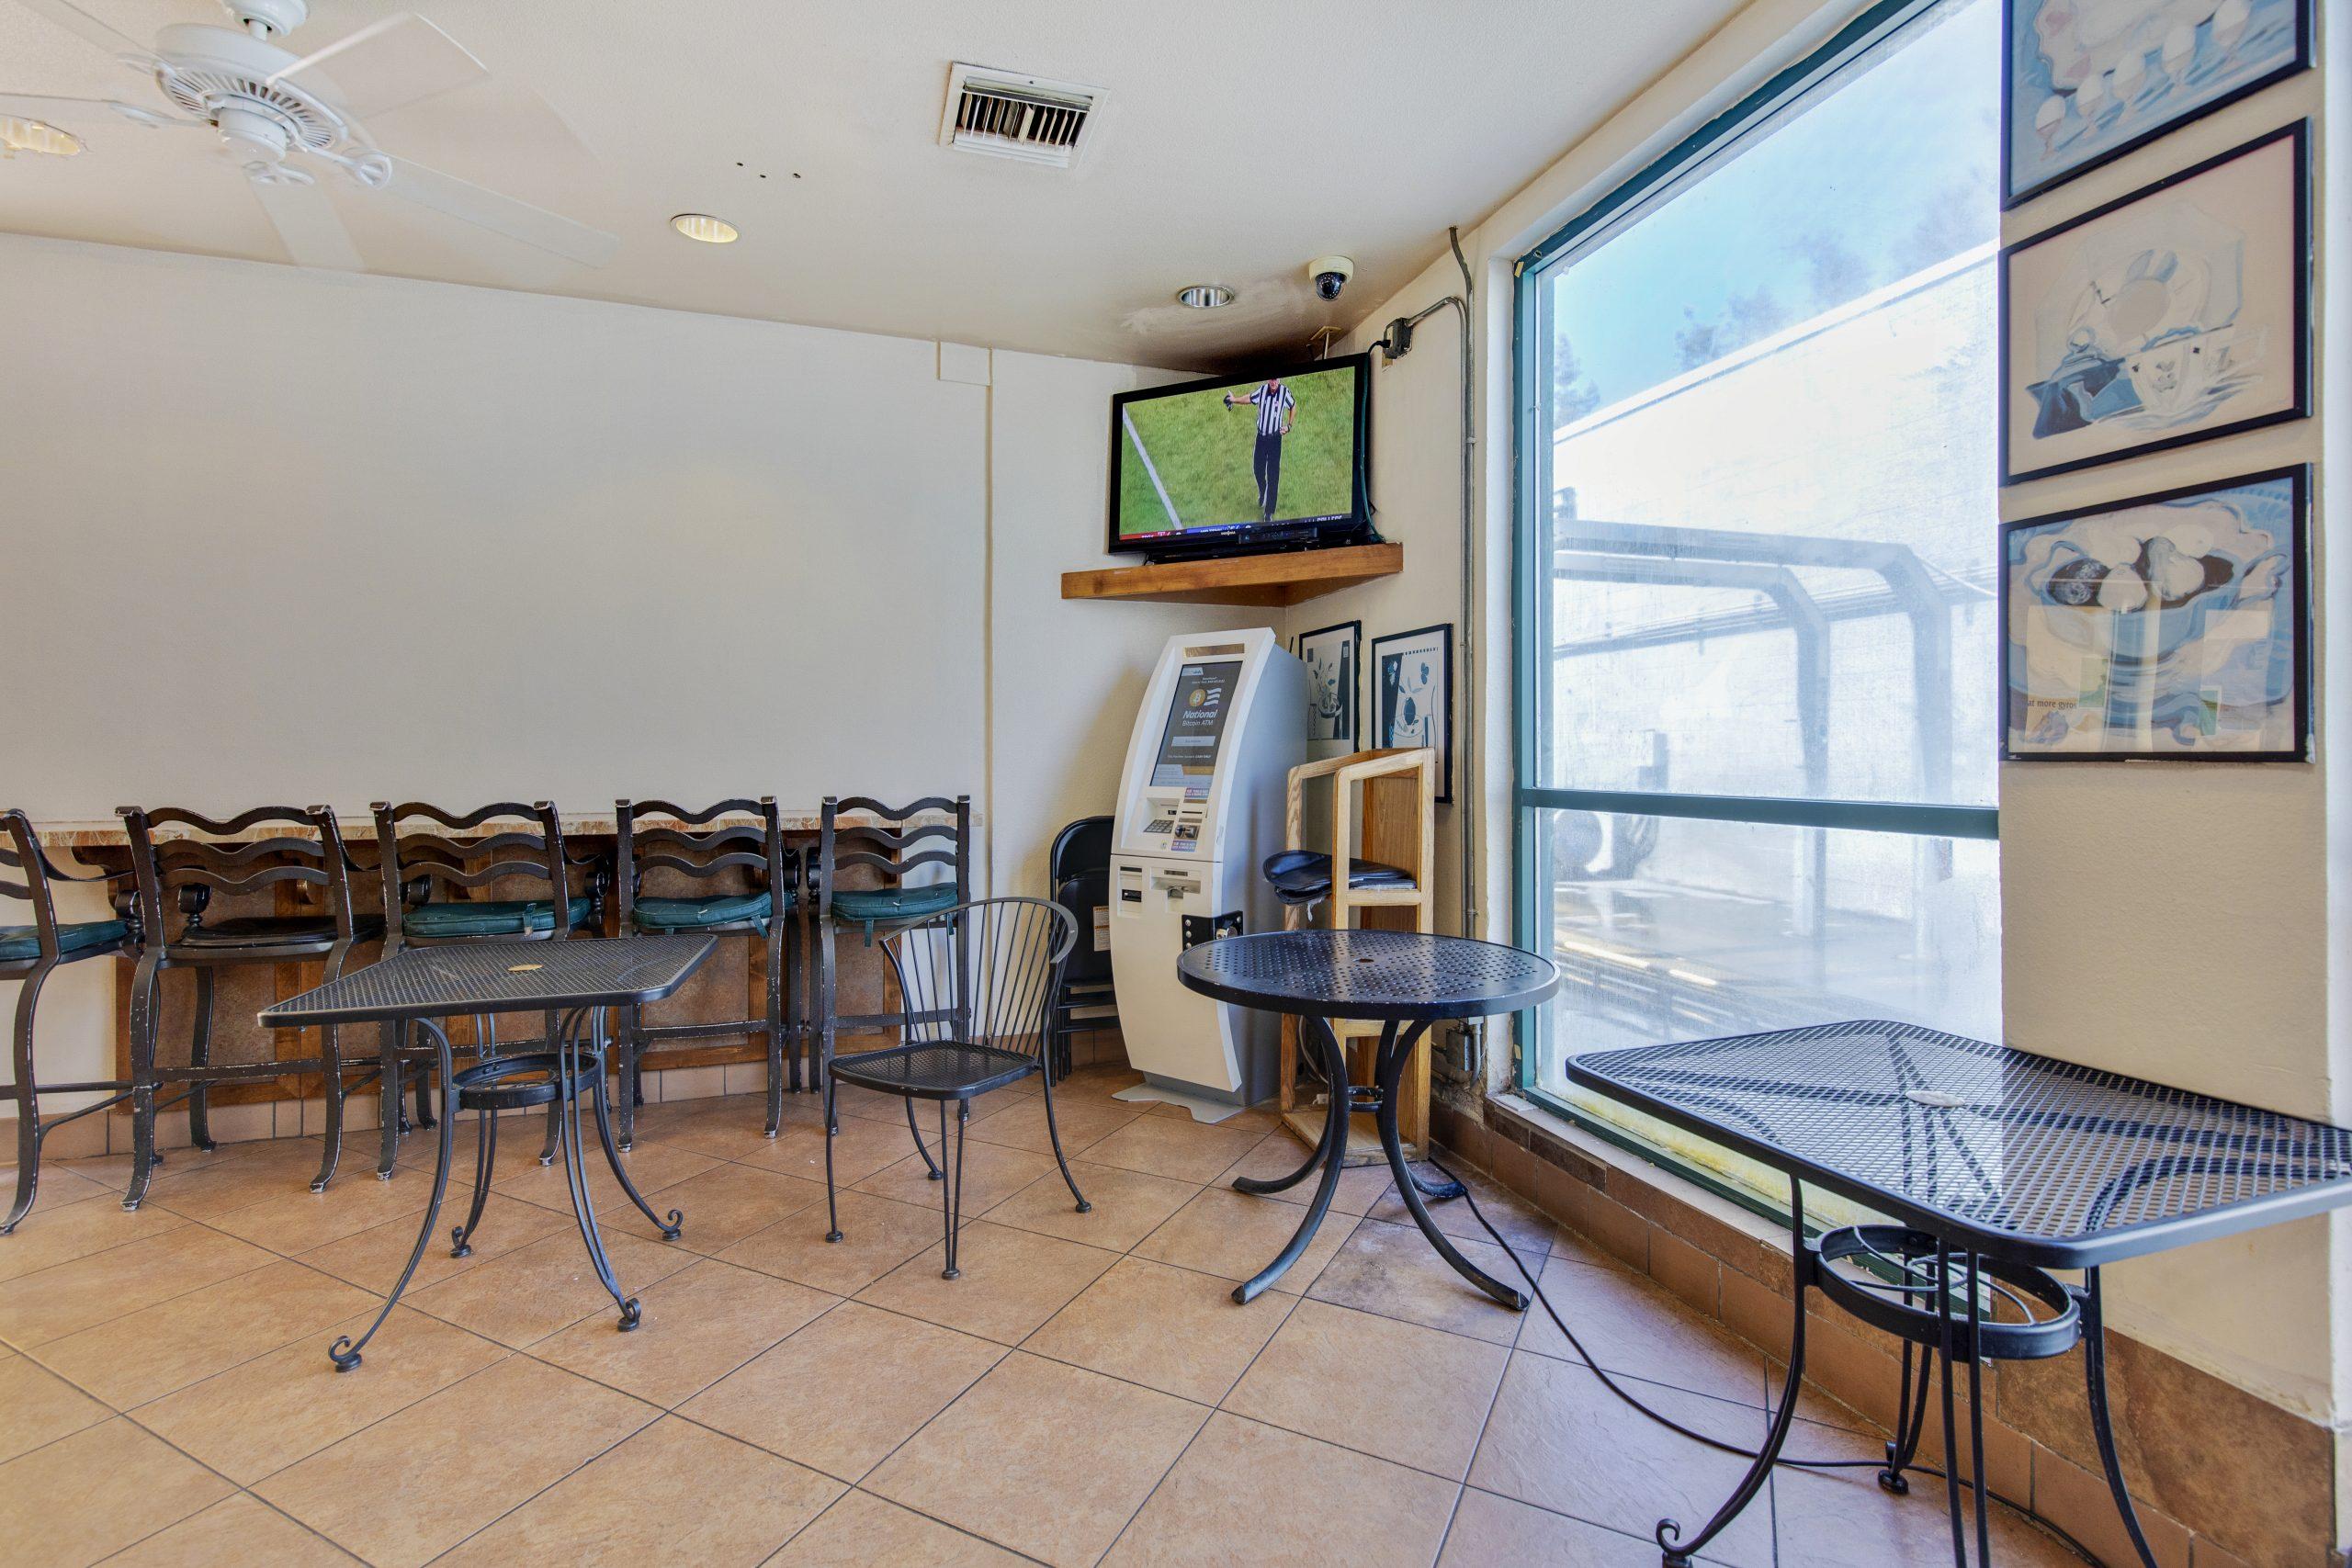 CV Restaurant seating area